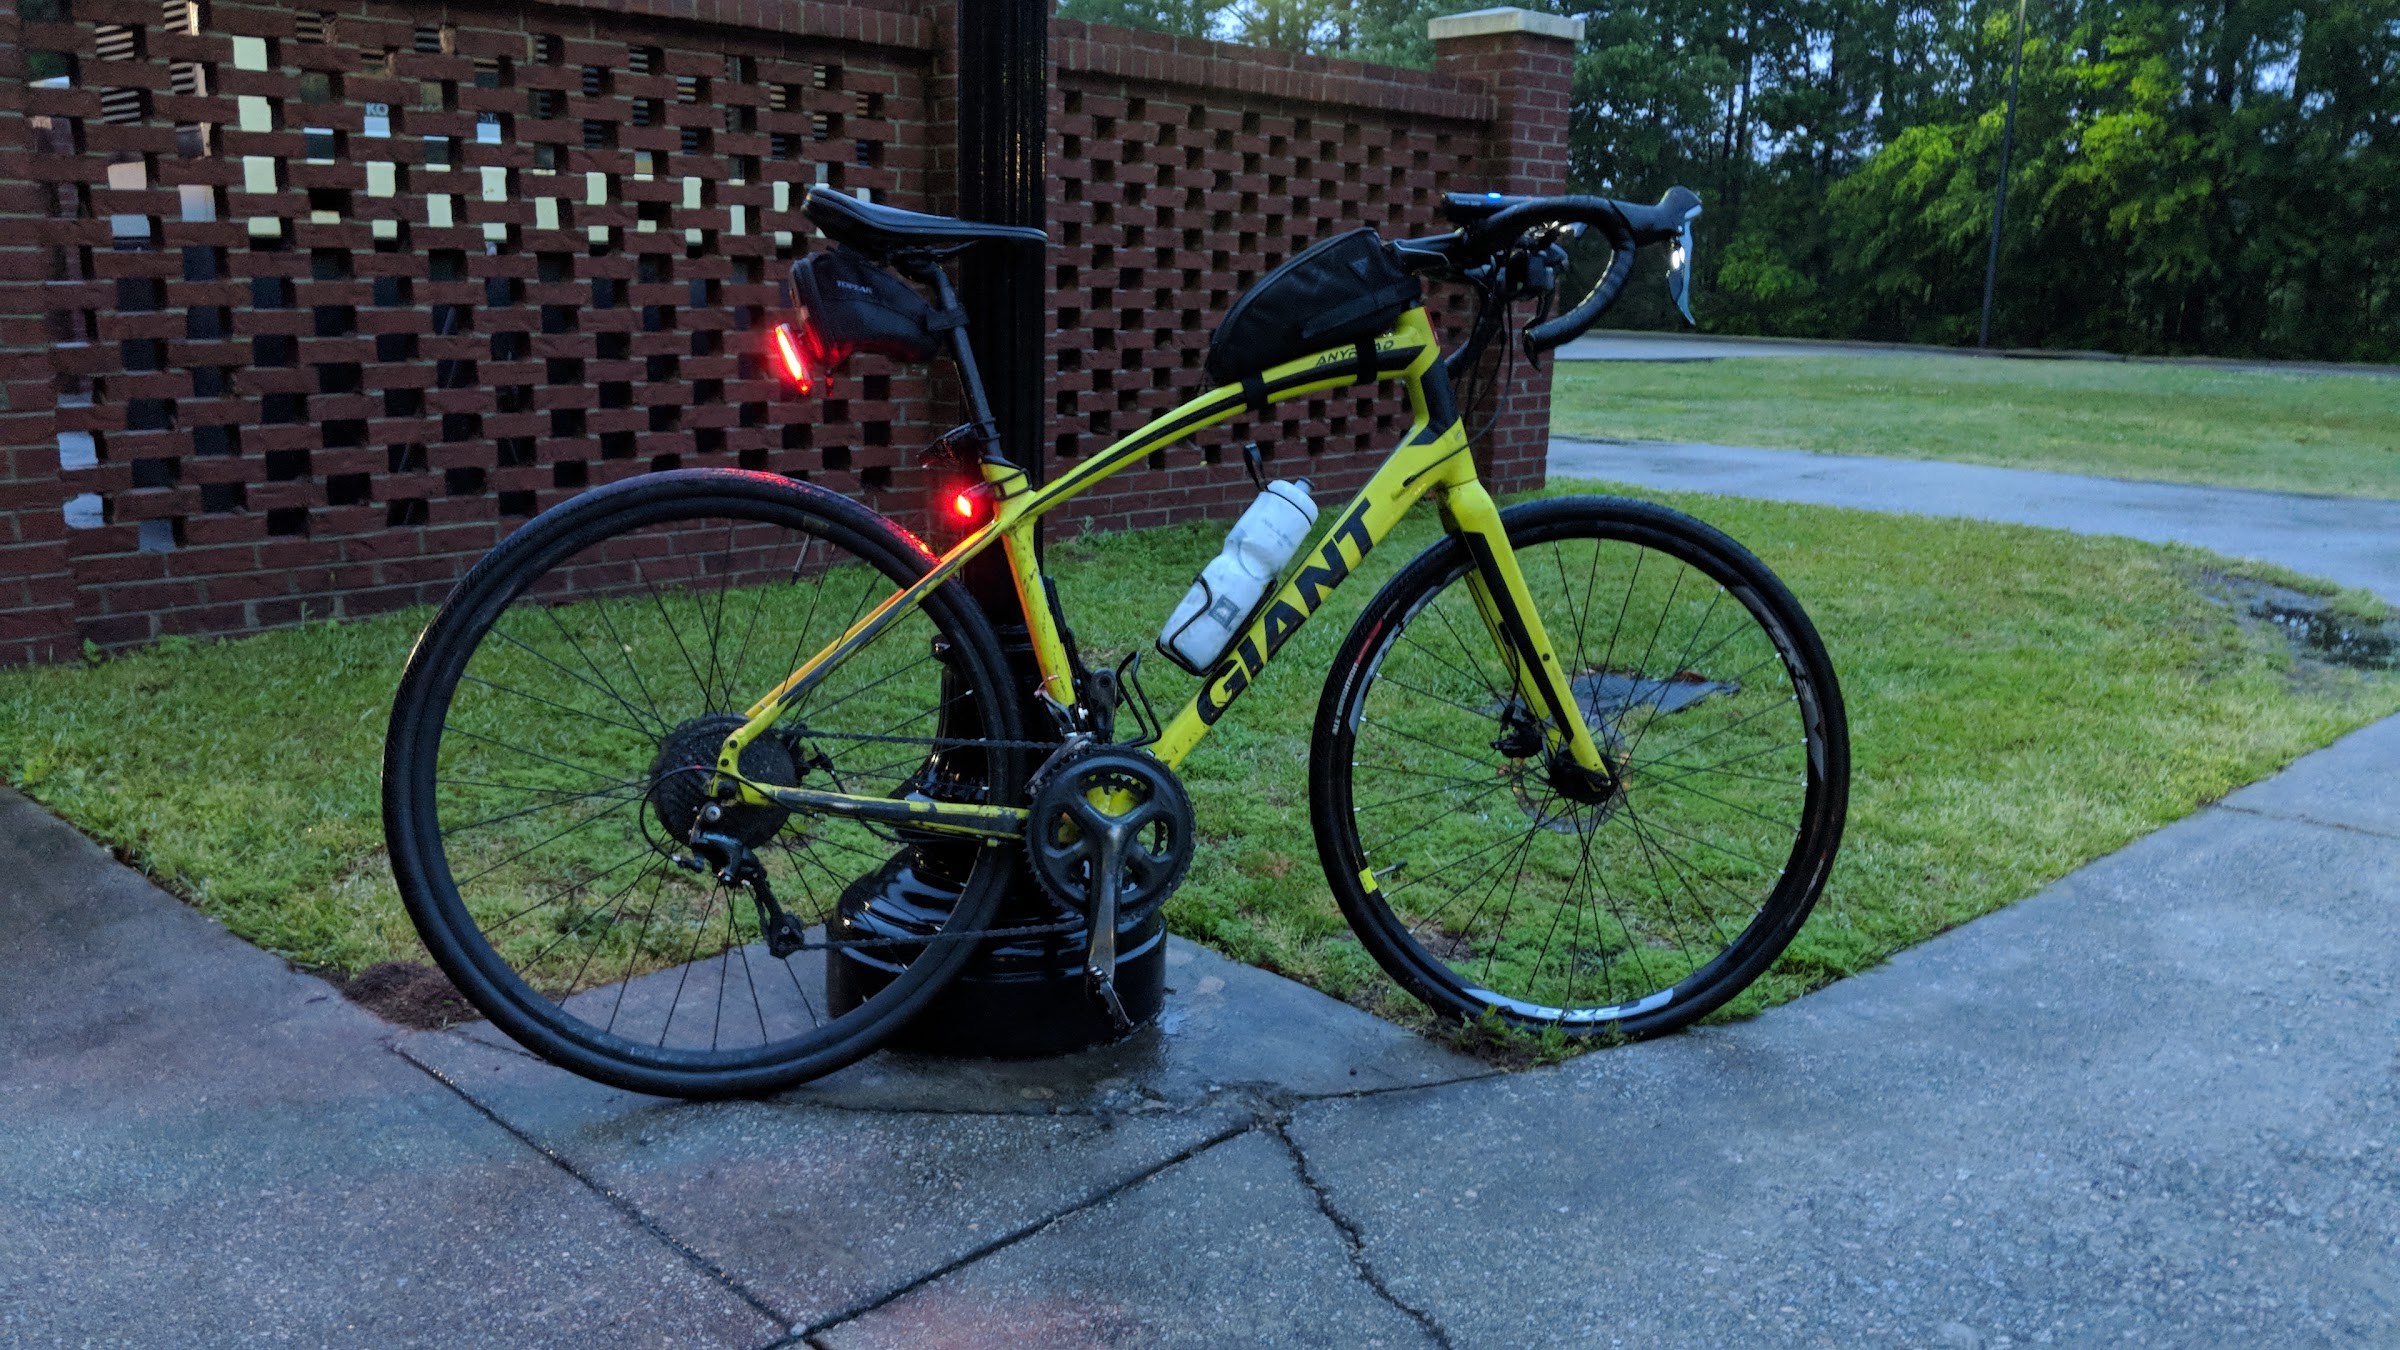 Bike leaning against light post at work